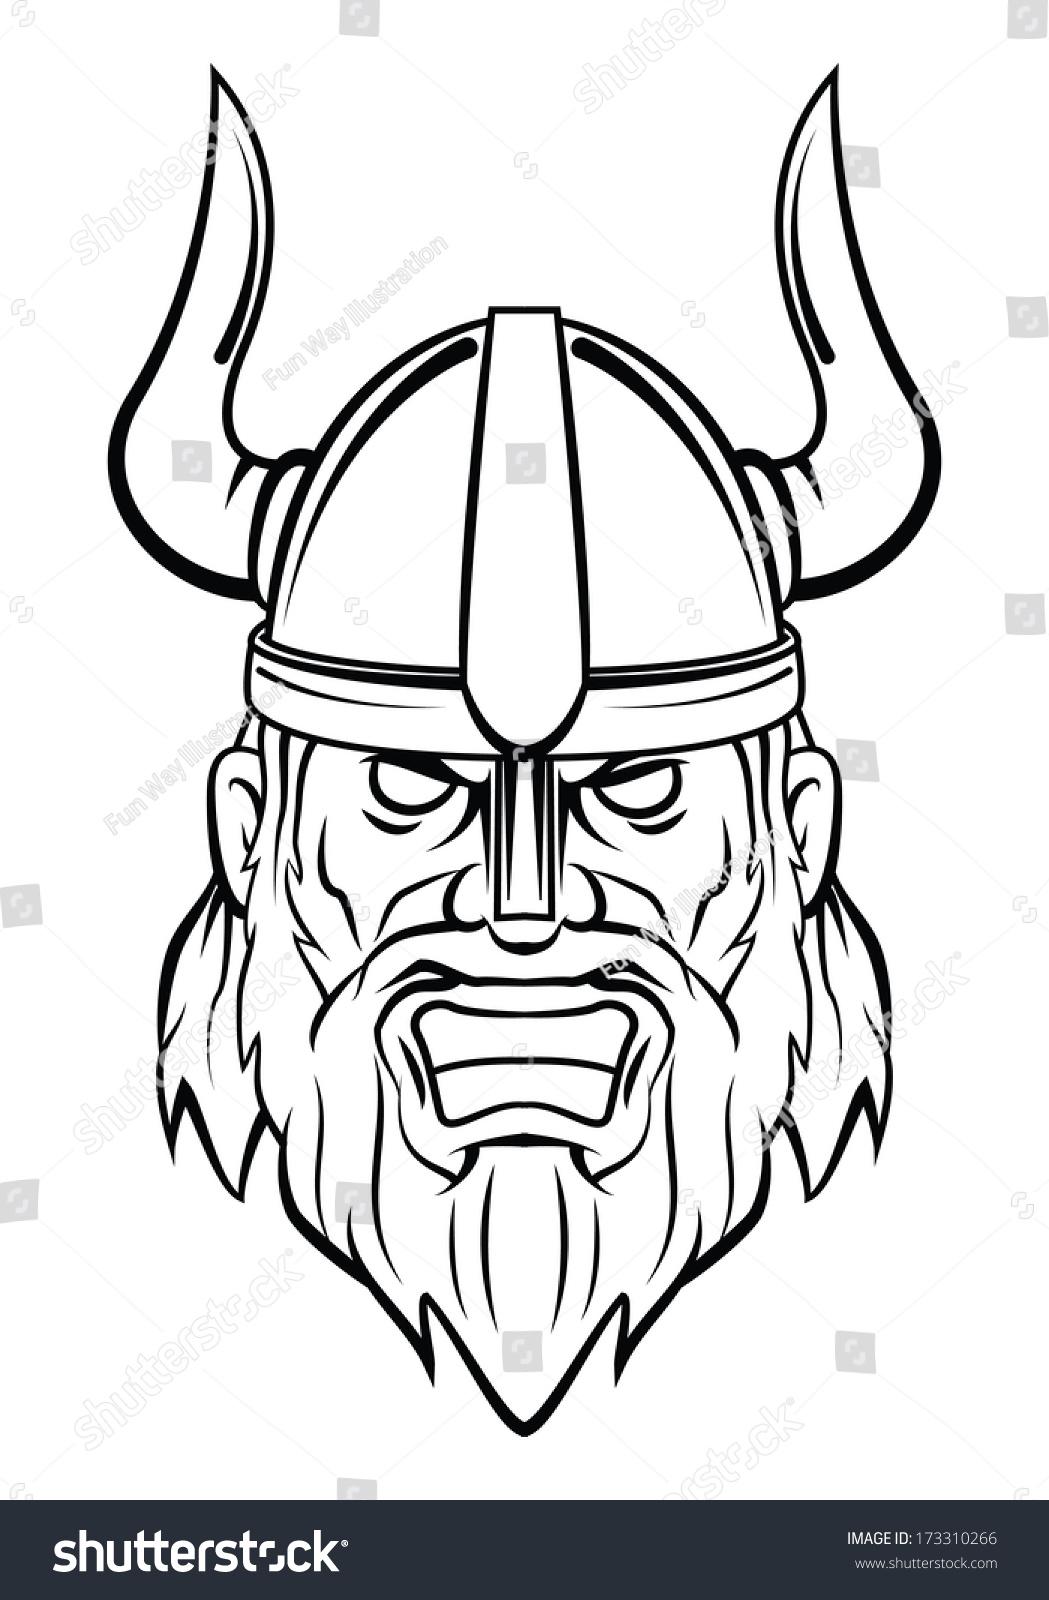 Viking Head Stock Illustration 173310266 - Shutterstock